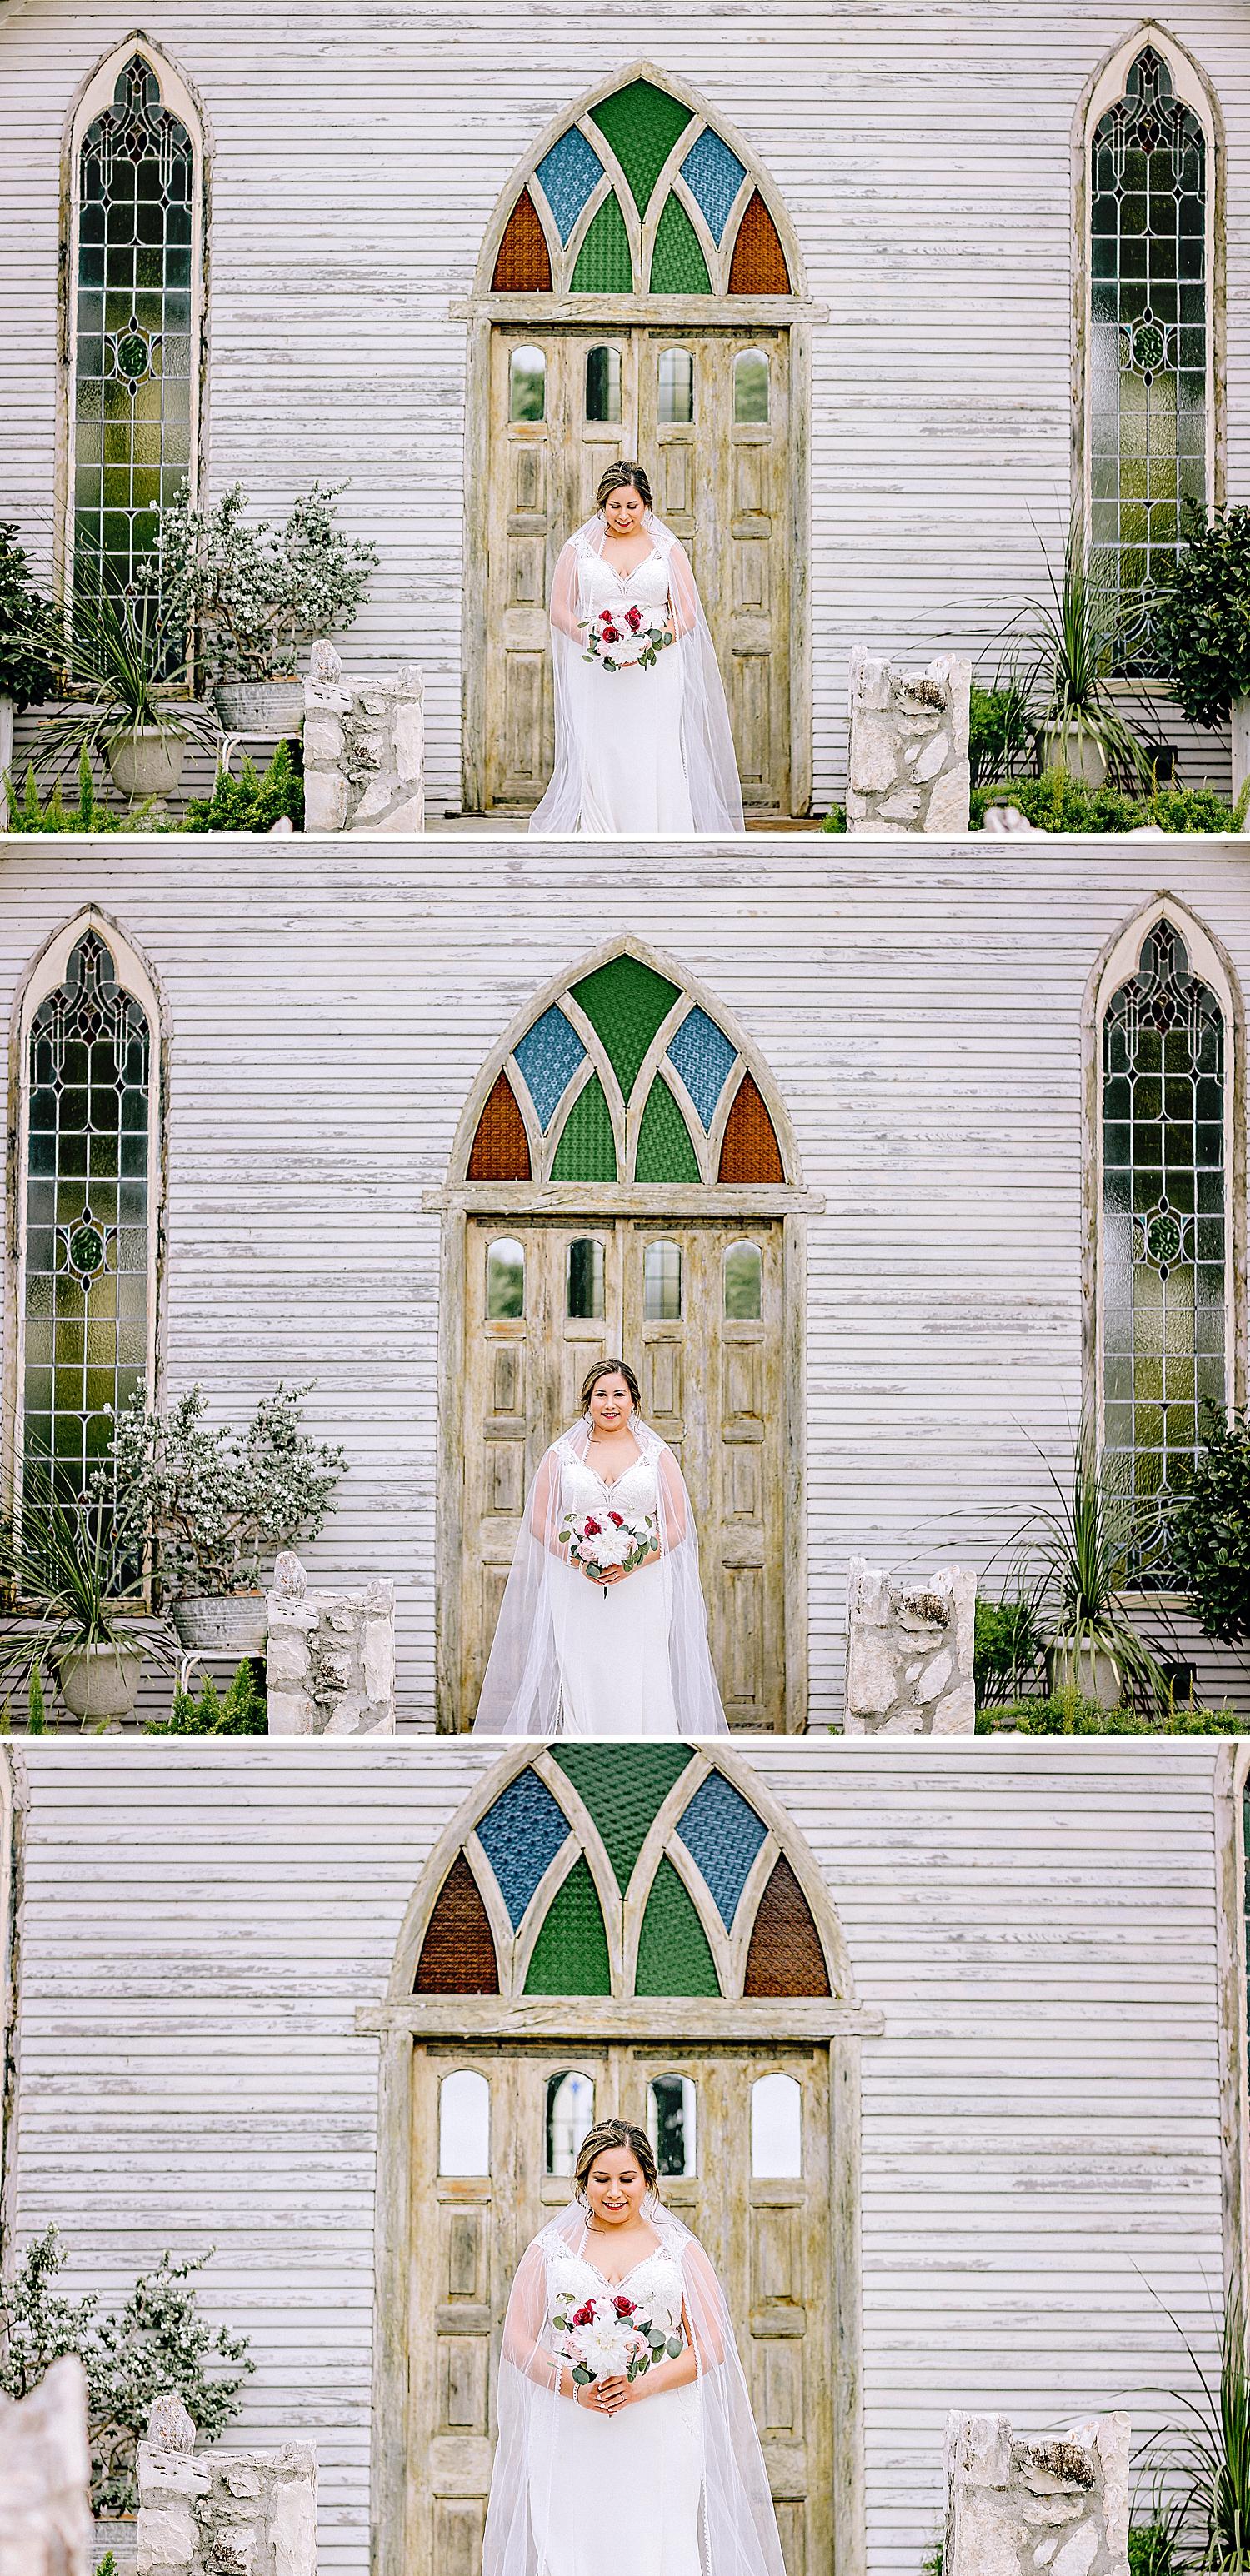 Carly-Barton-Photography-Gruene-Estate-Wedding-Photographer-New-Braunfels-Texas-Bridal-Session_0019.jpg